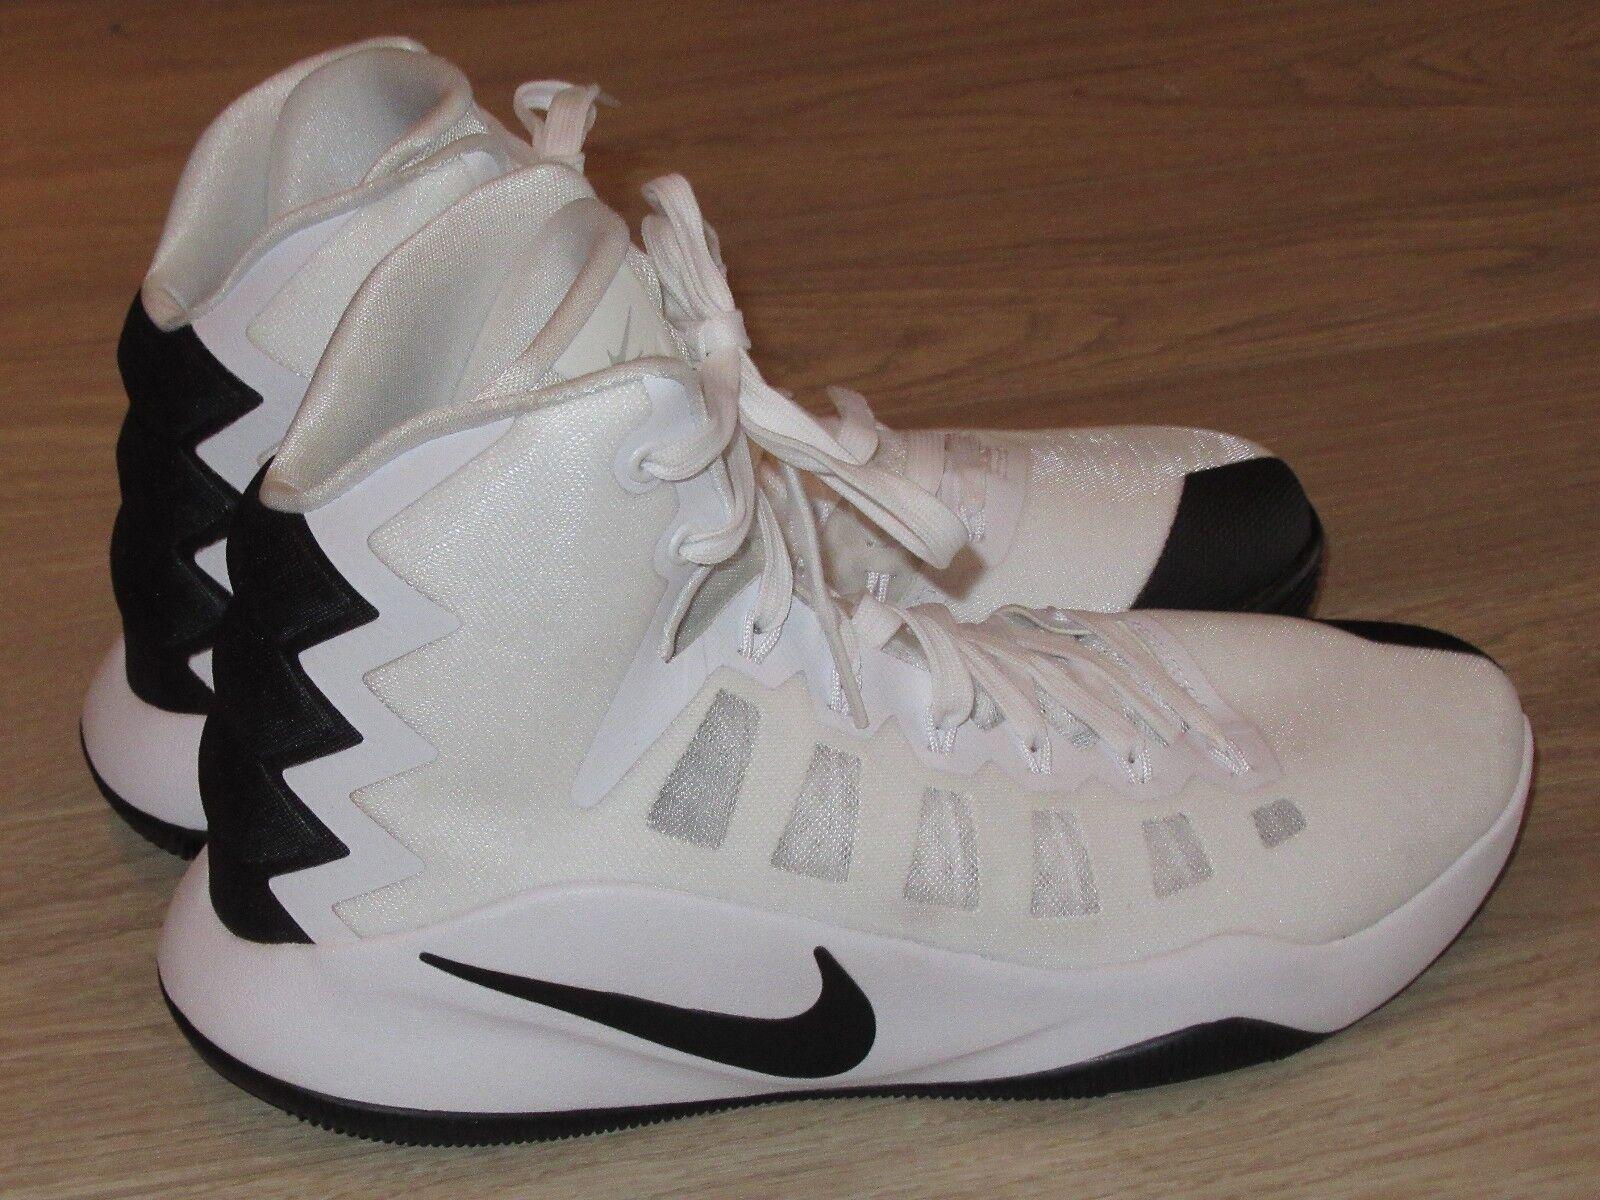 Nike Zoom Hyperdunk Mens Basketball Sneakers Sneakers Sneakers shoes White 11 910fc3